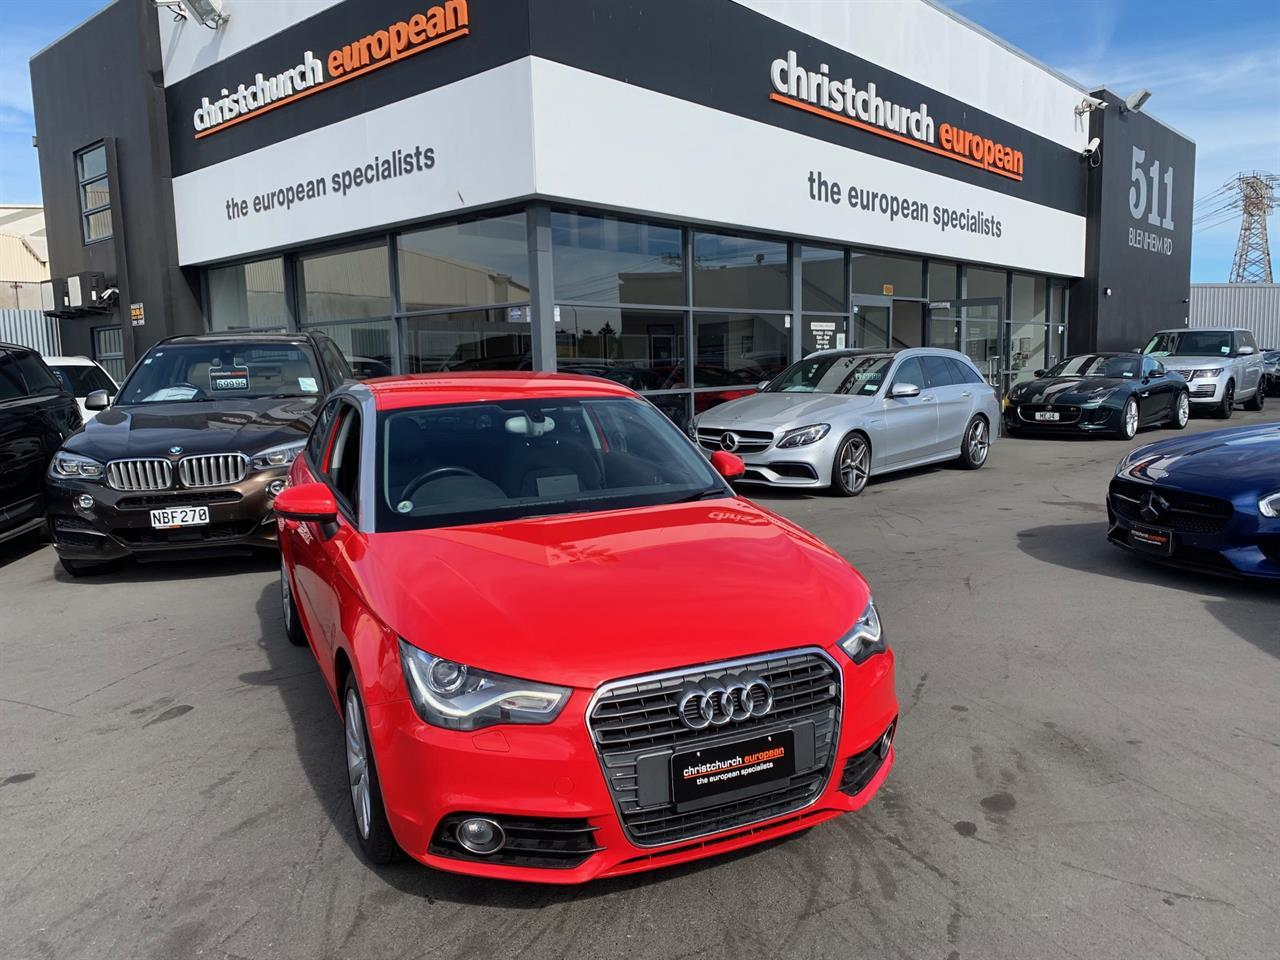 image-1, 2011 Audi A1 1.4 TSI 7 Speed at Christchurch